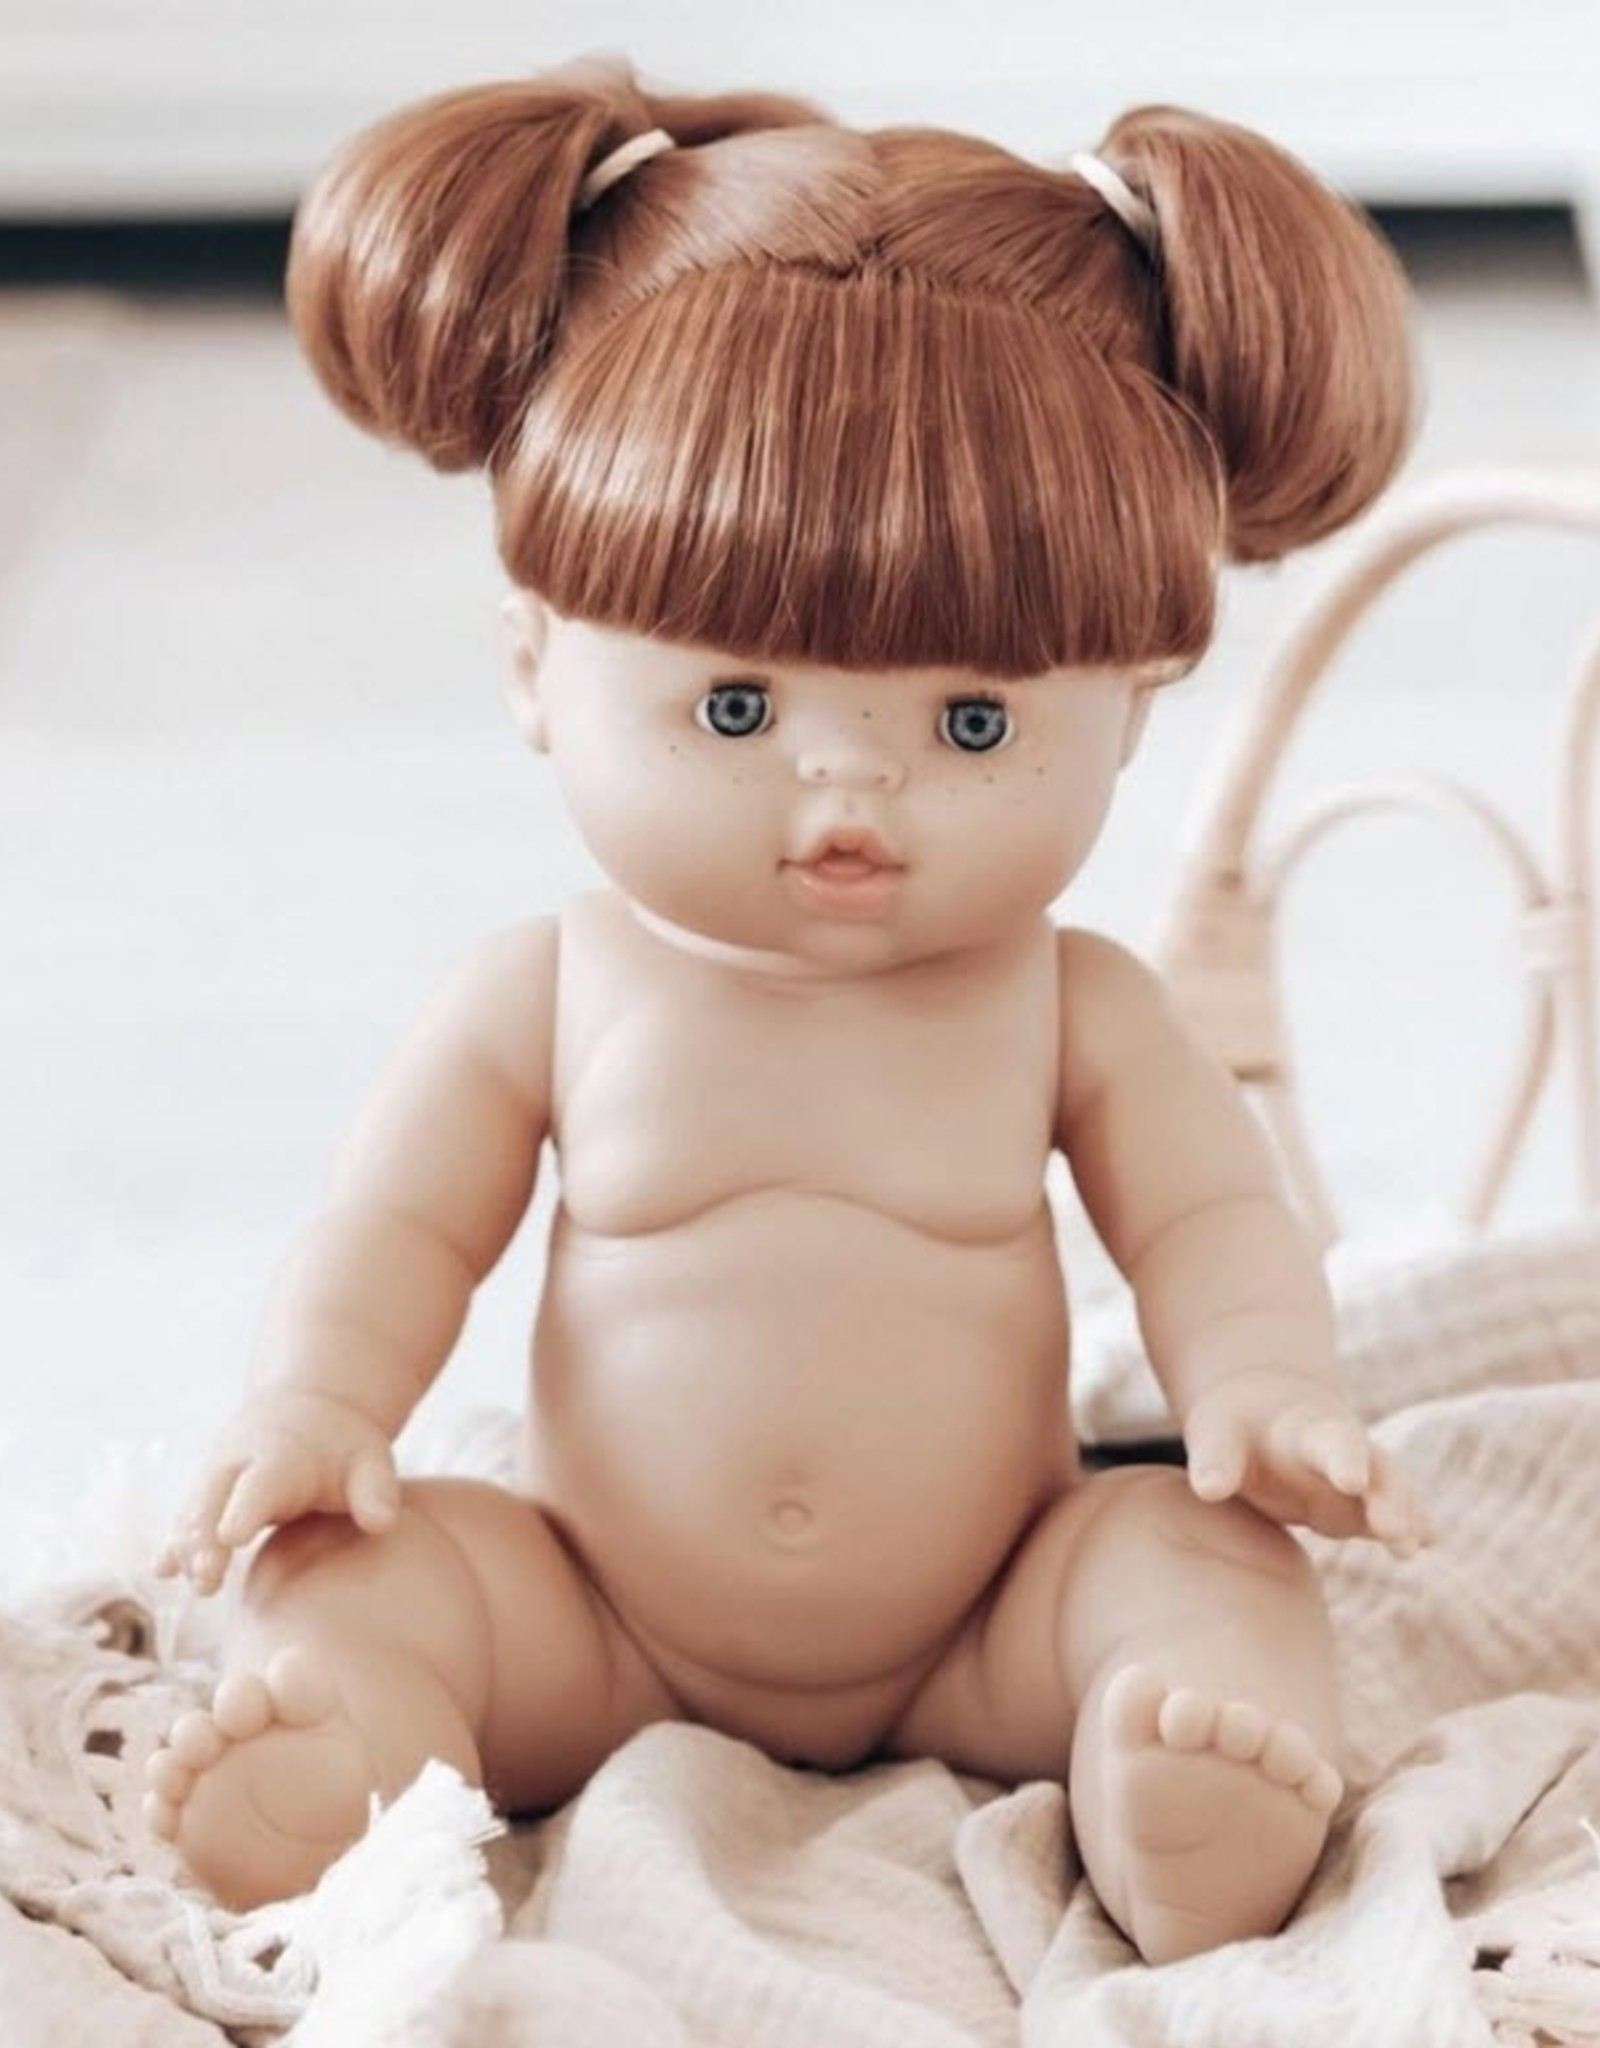 Paola Reina Paola Reina - Gordis Redhead Doll Summer 34cm